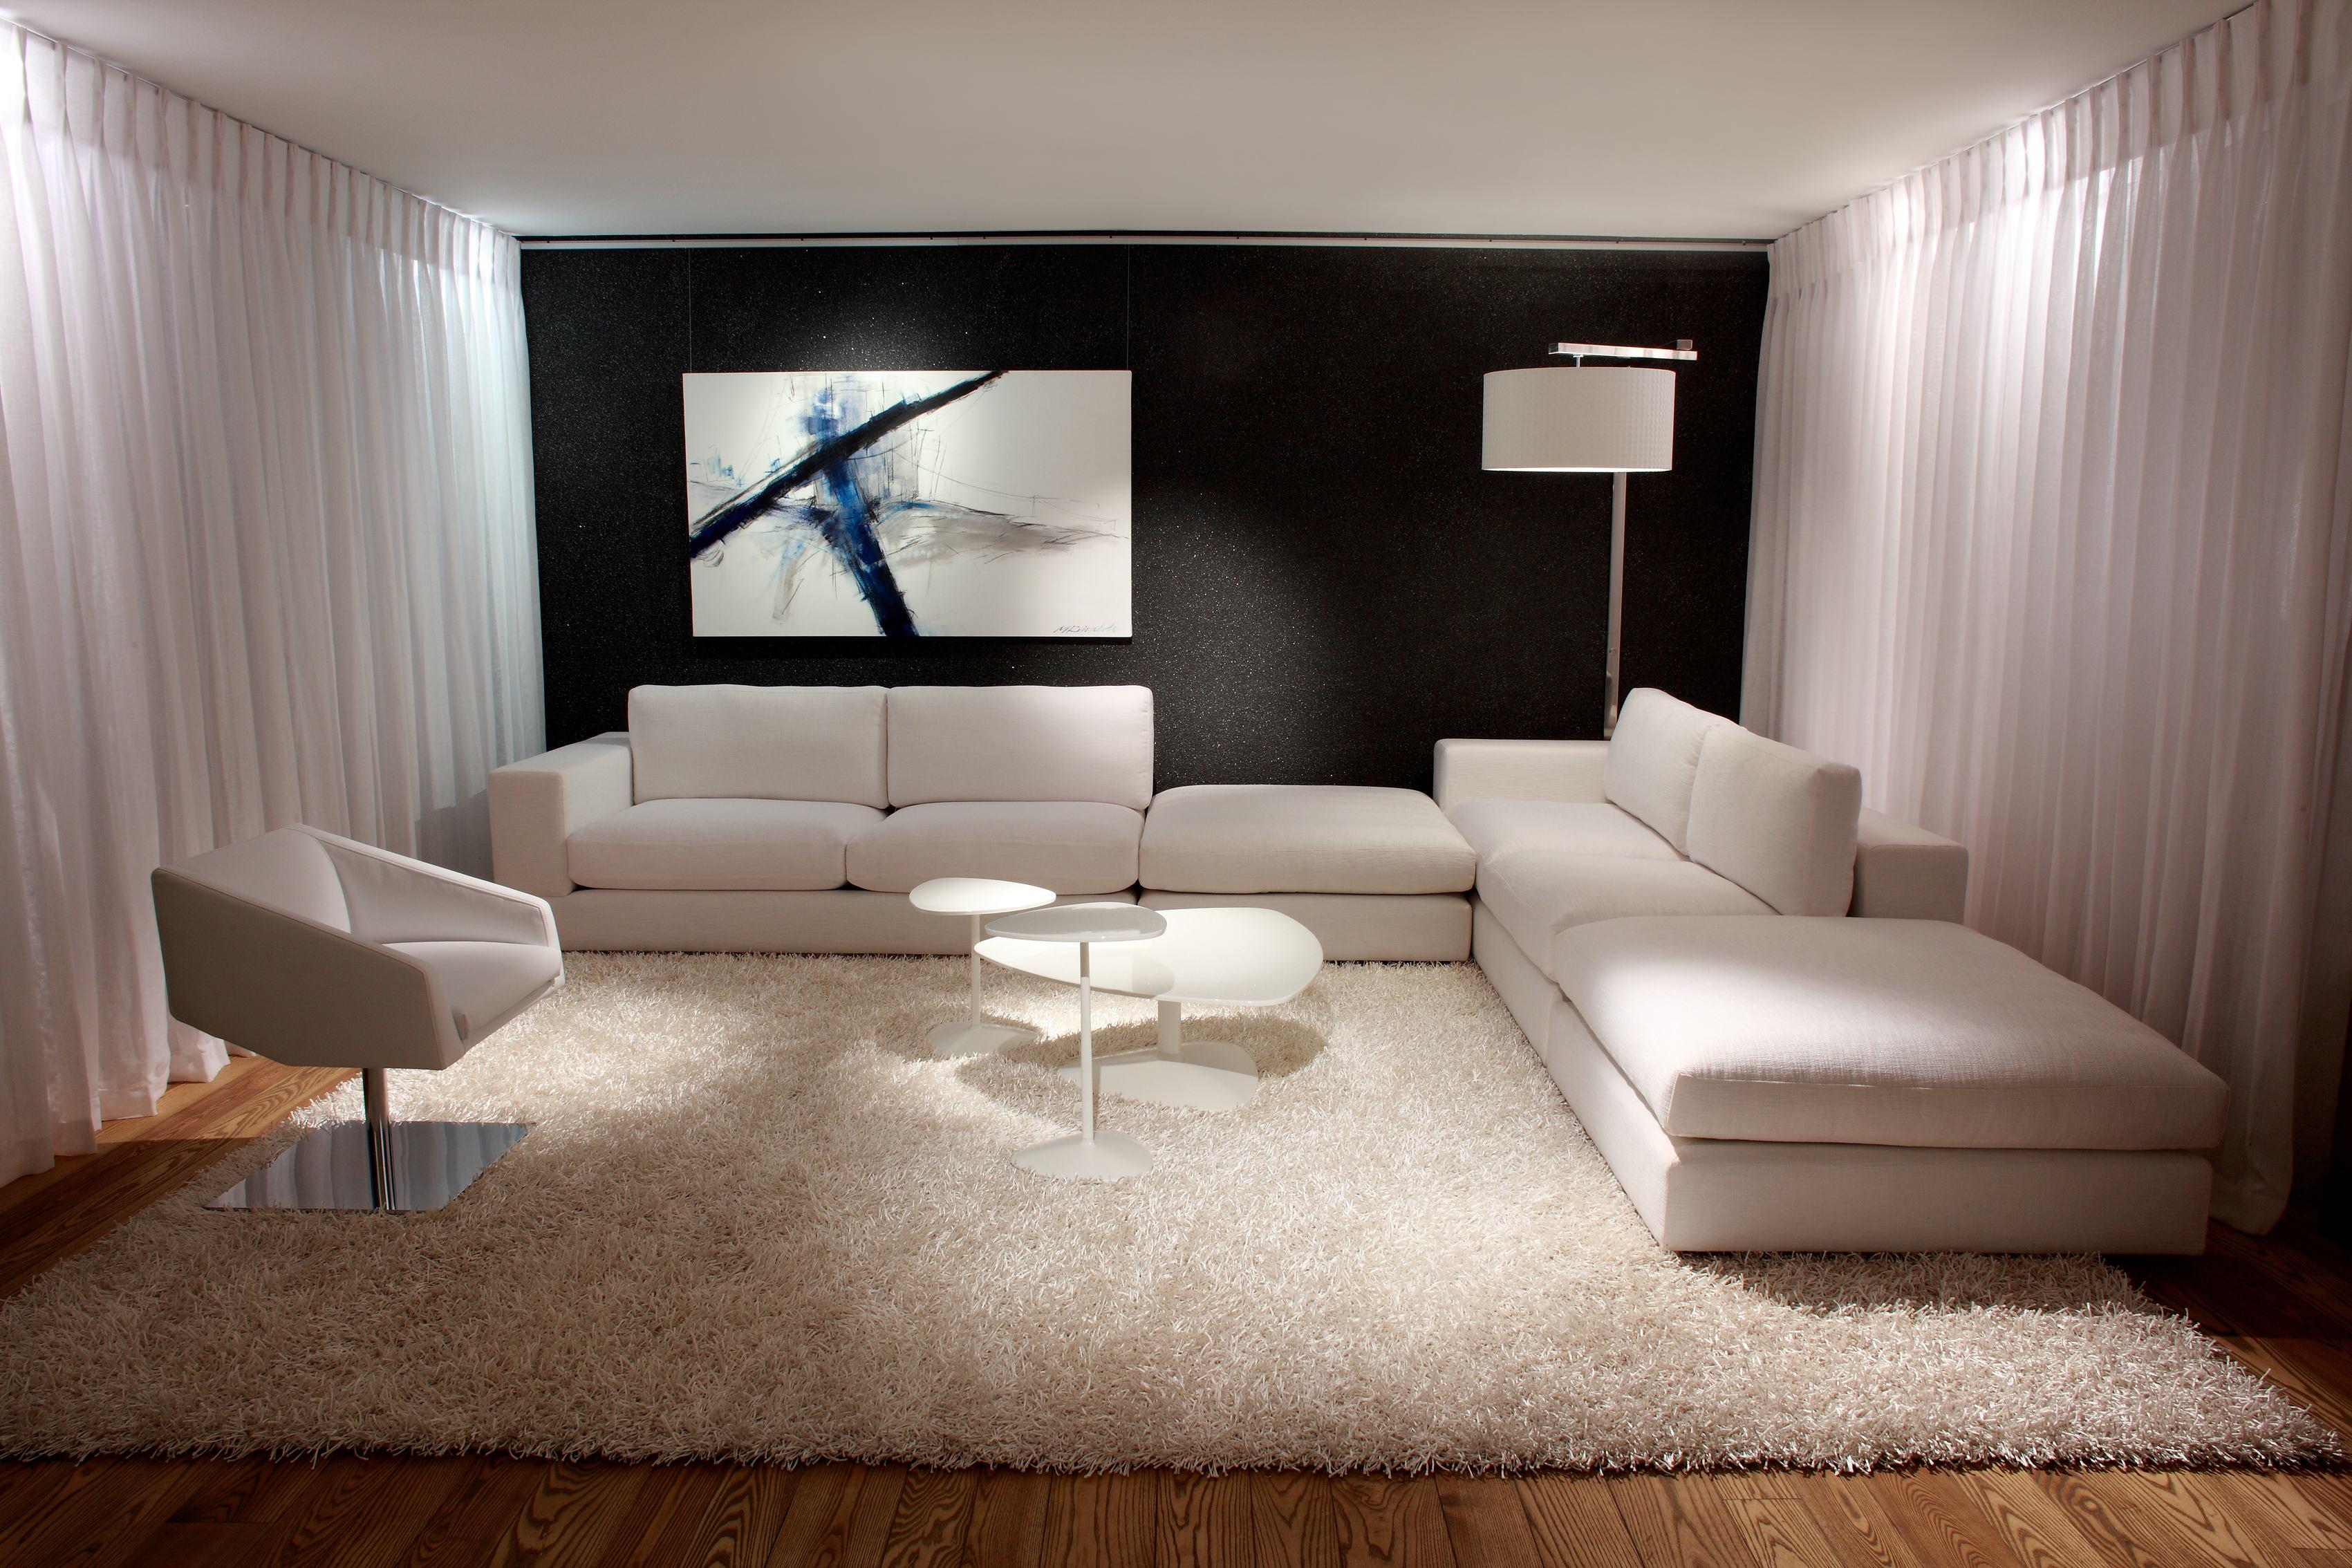 M-Interiors Tomi Corner Sofa R45 000 (in Winning Weaves by Home Fabrics) HR